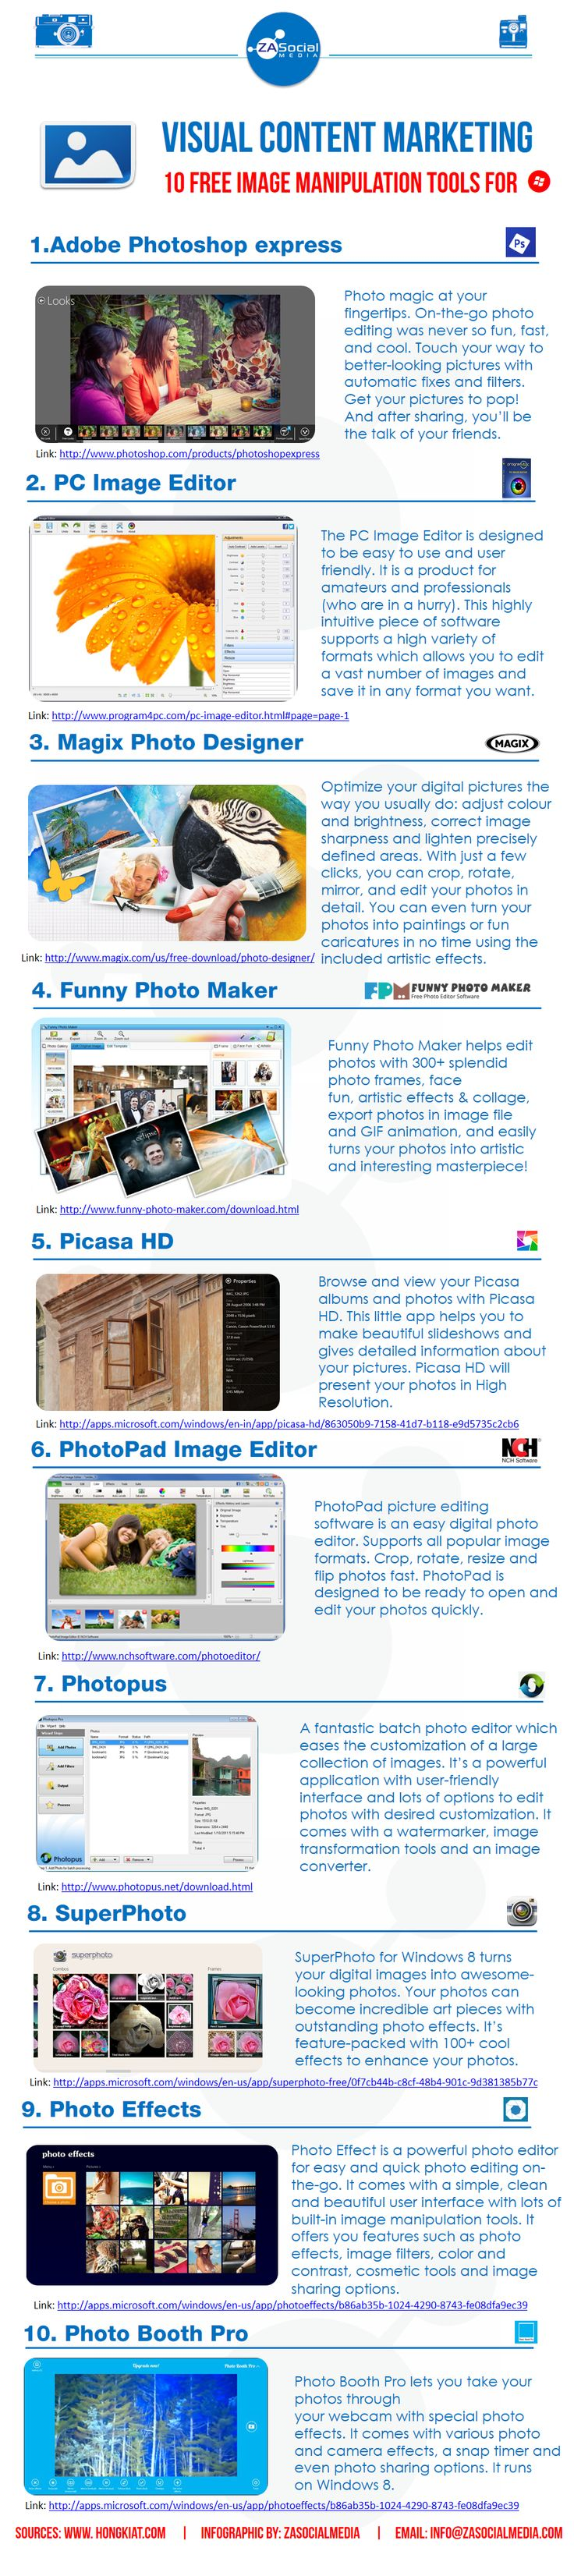 Visual Content Marketing - 10 Free Image Manipulation Tools